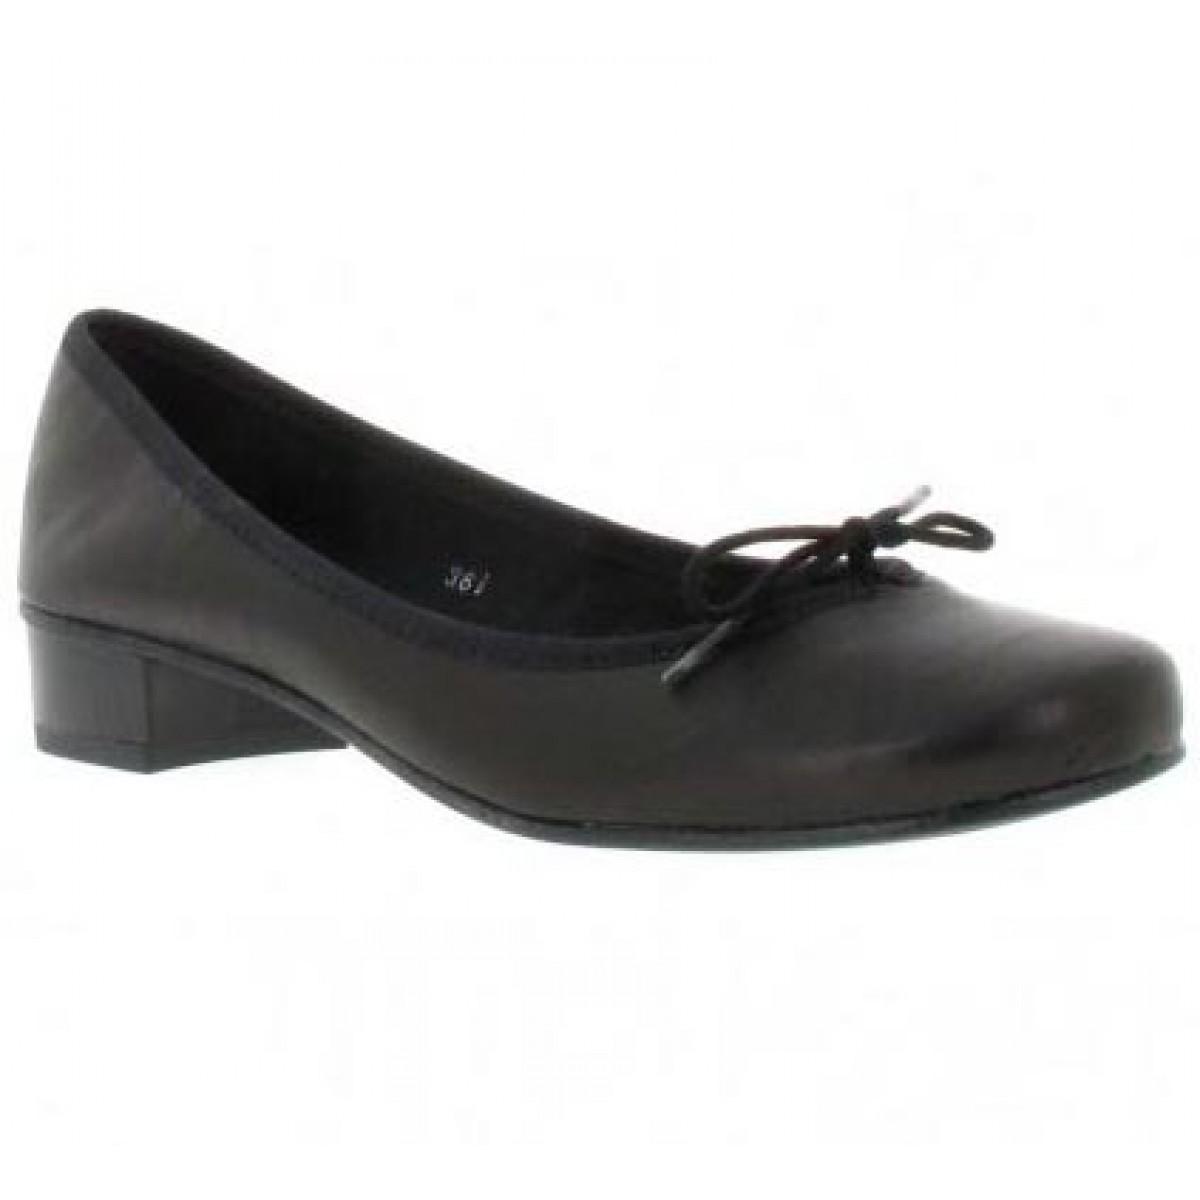 Ballerines HIRICA Lautrec cuir Femme Noir